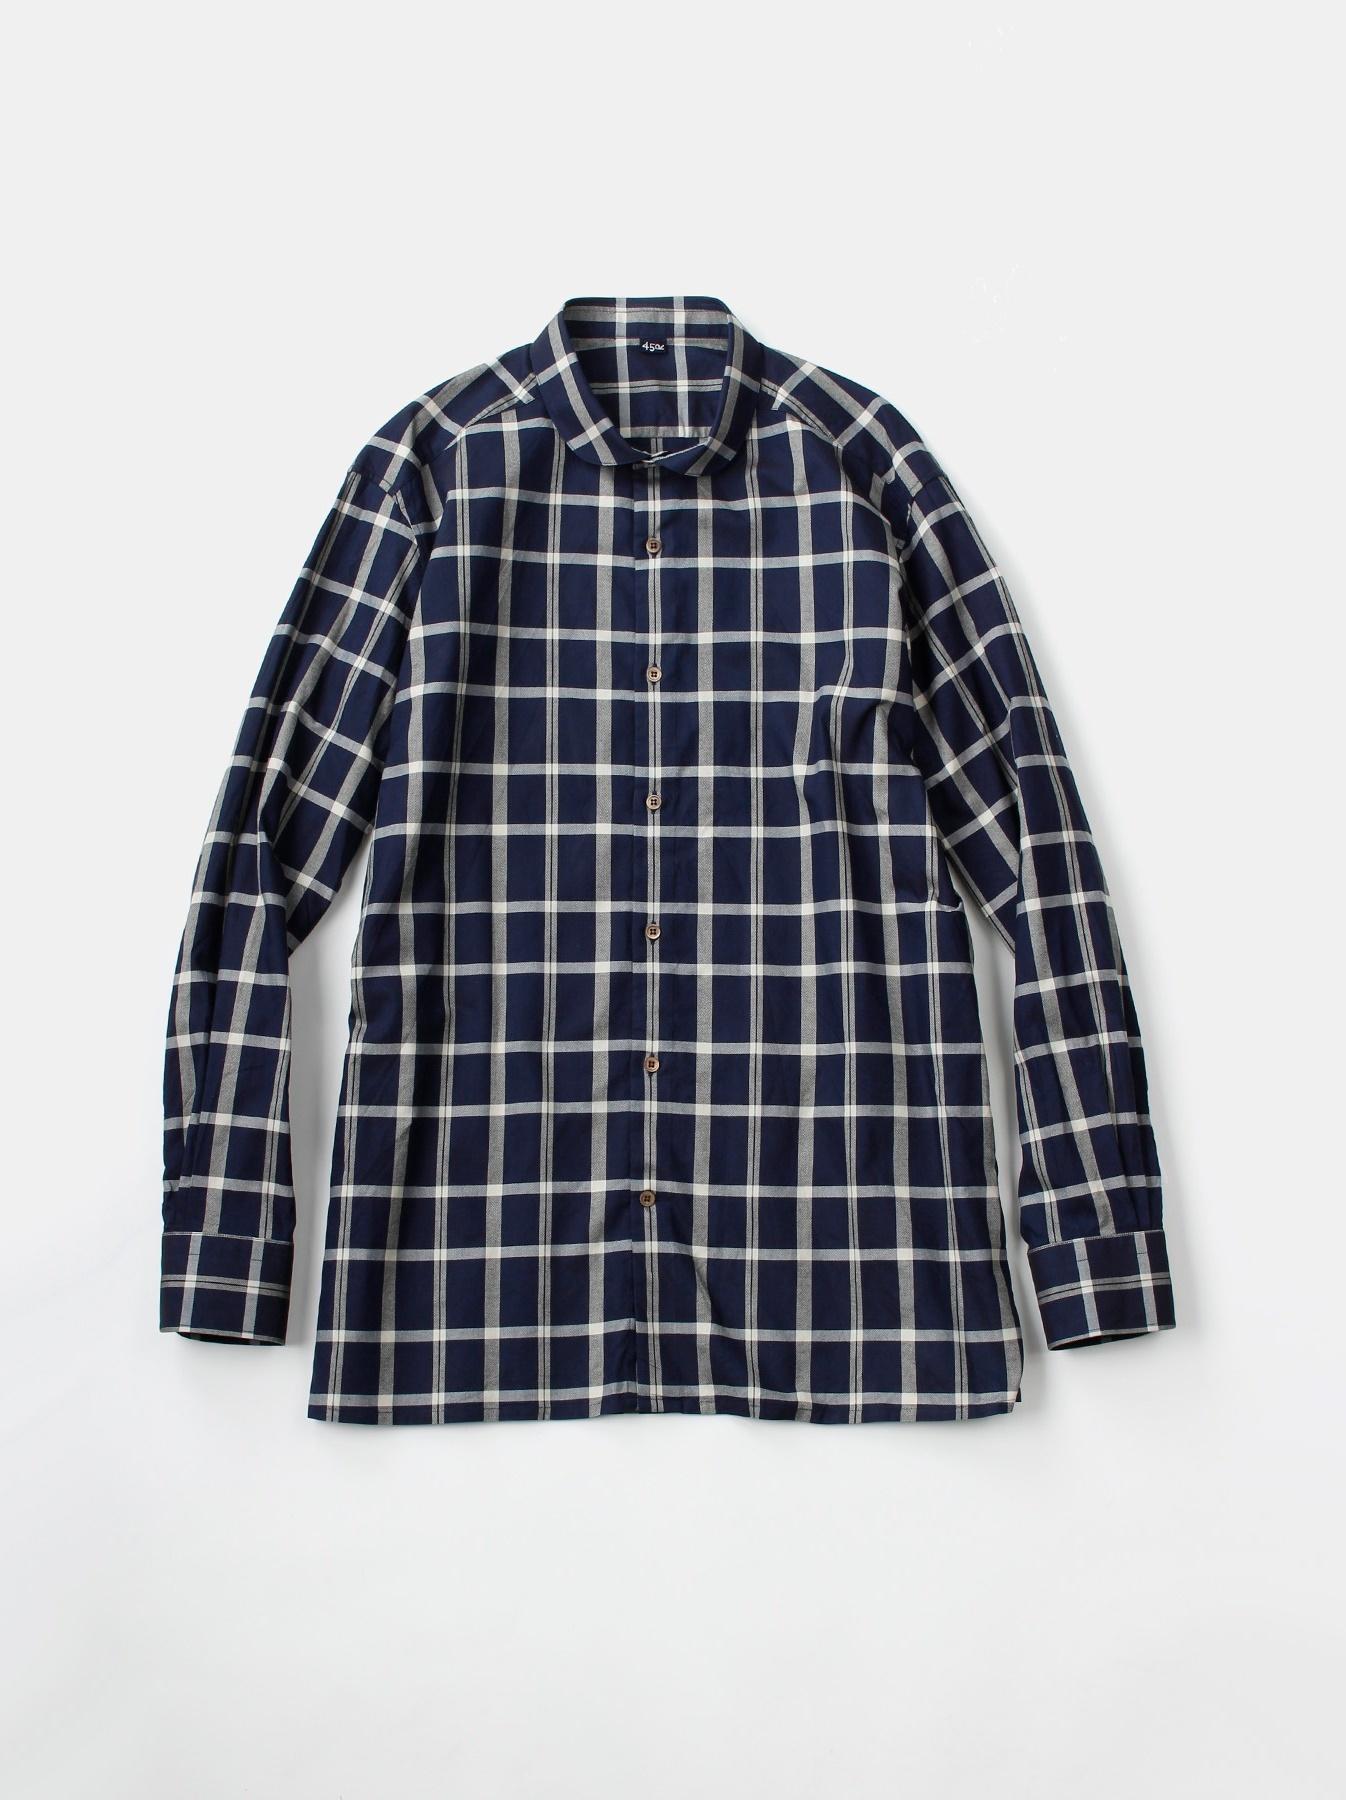 WH Indigo Oxford 908 Round Collar Shirt-1